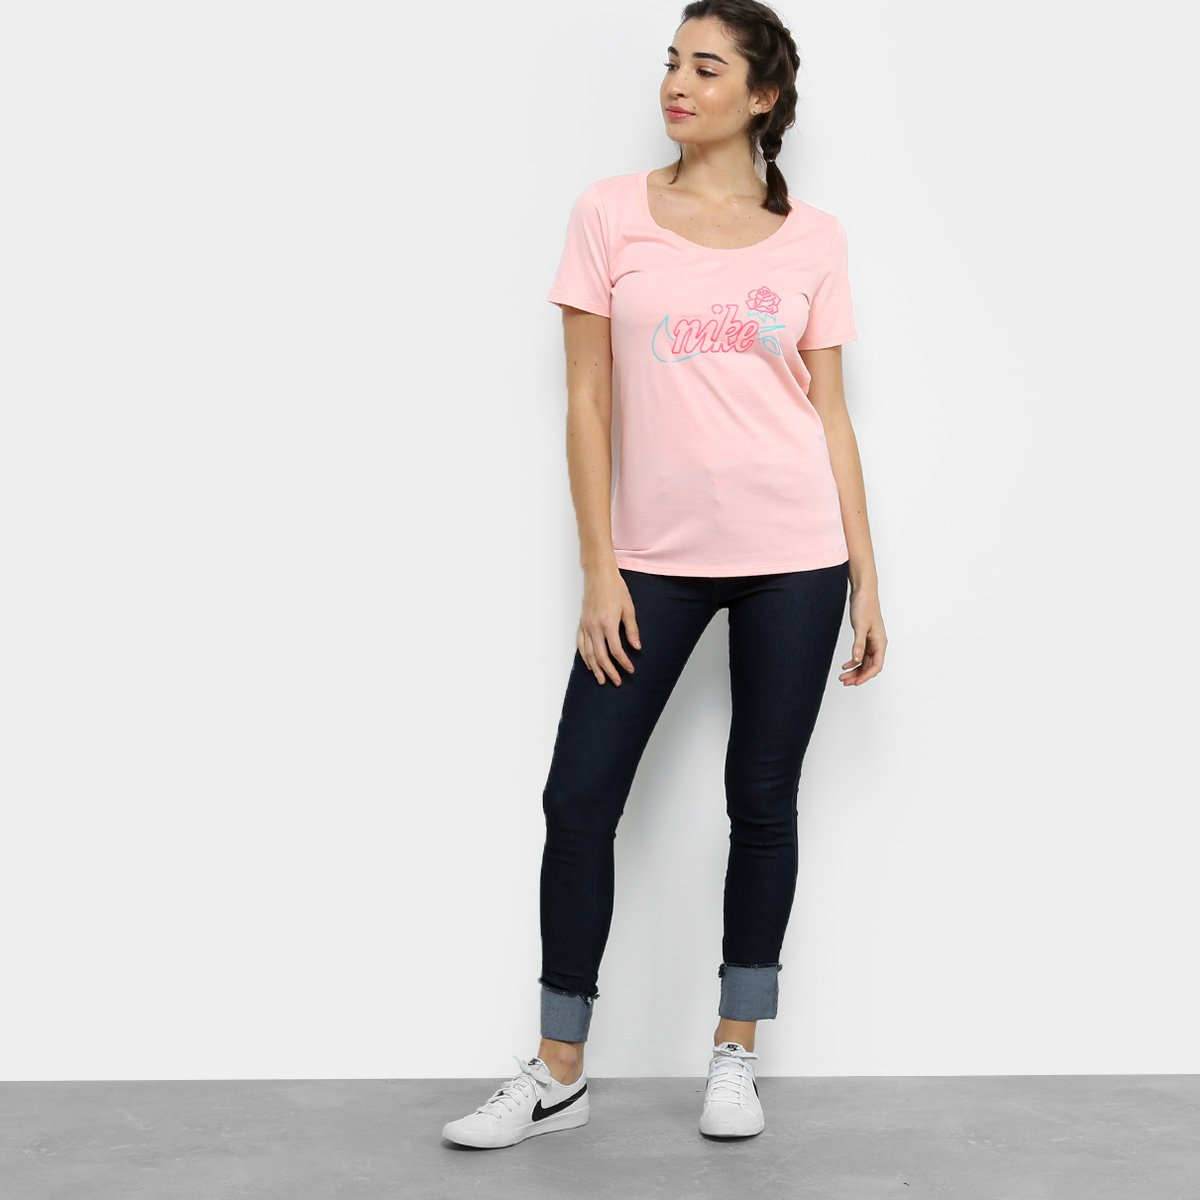 Camiseta Rosa Apla Feminina Scoop Camiseta Nike Nike Art OXgq50nW